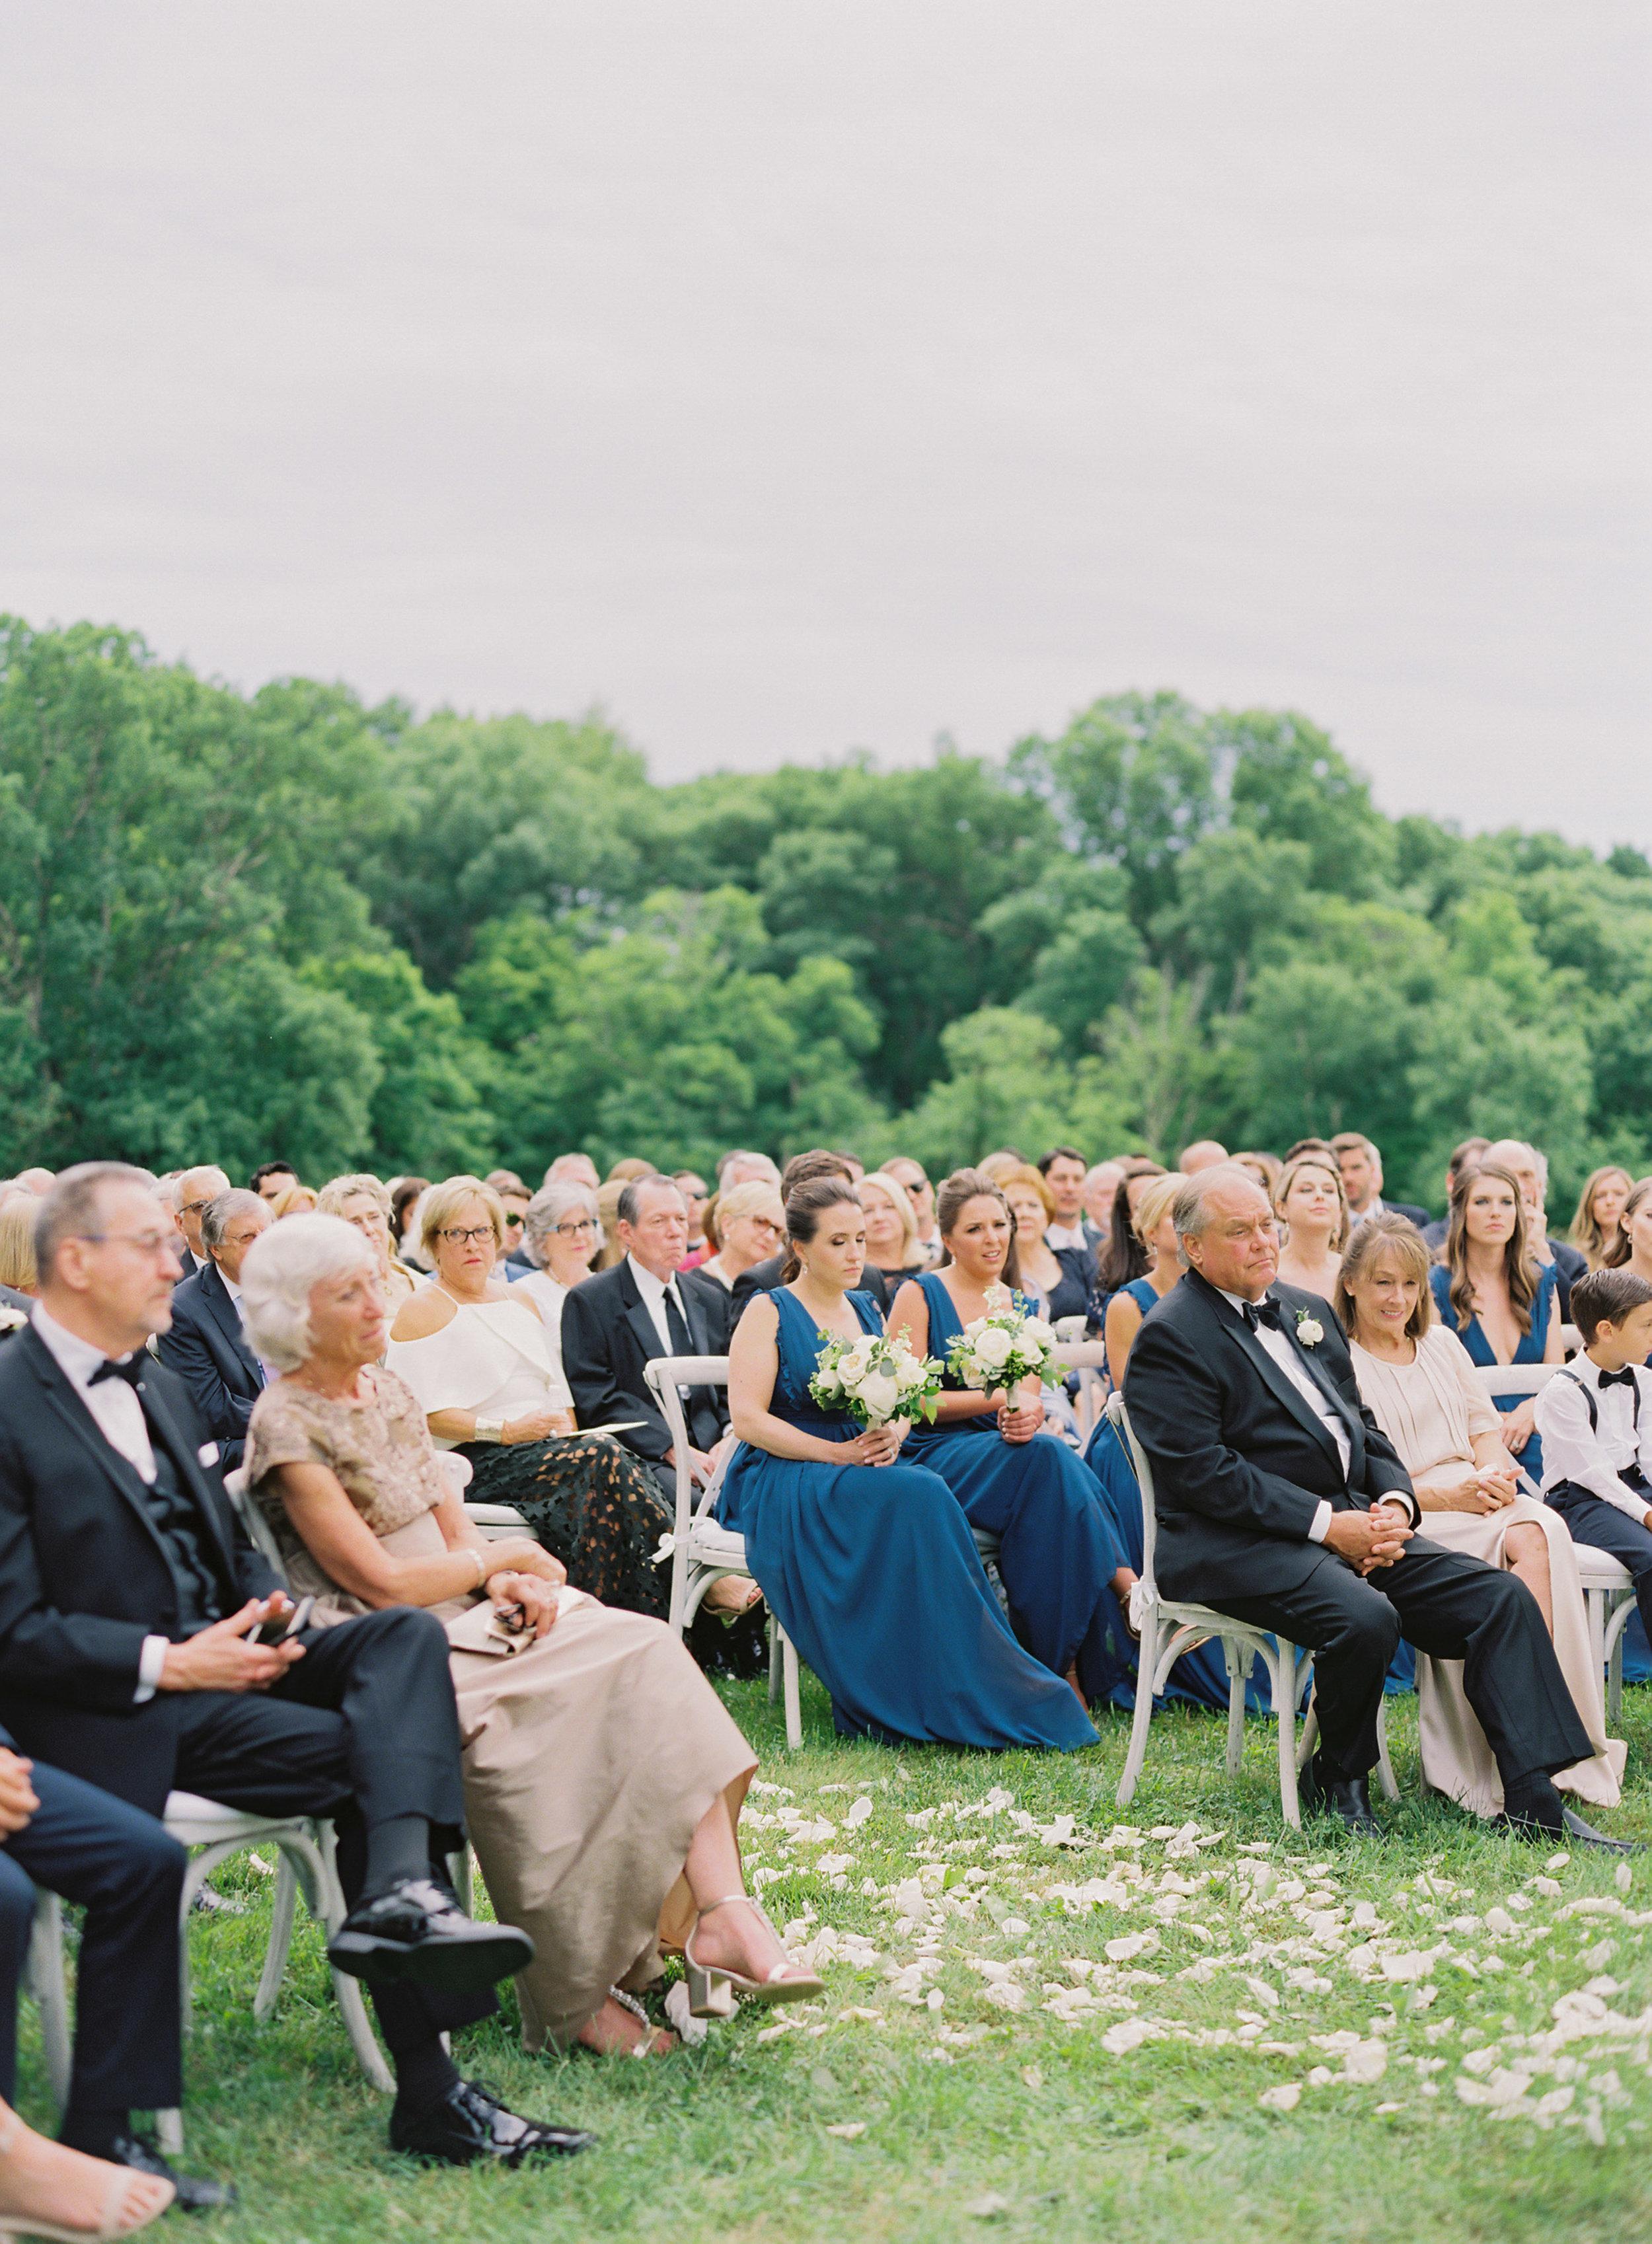 Ankony_Farm_Wedding-108-Jen-Huang-AS-463-Jen-Huang-003152-R1-011.jpg